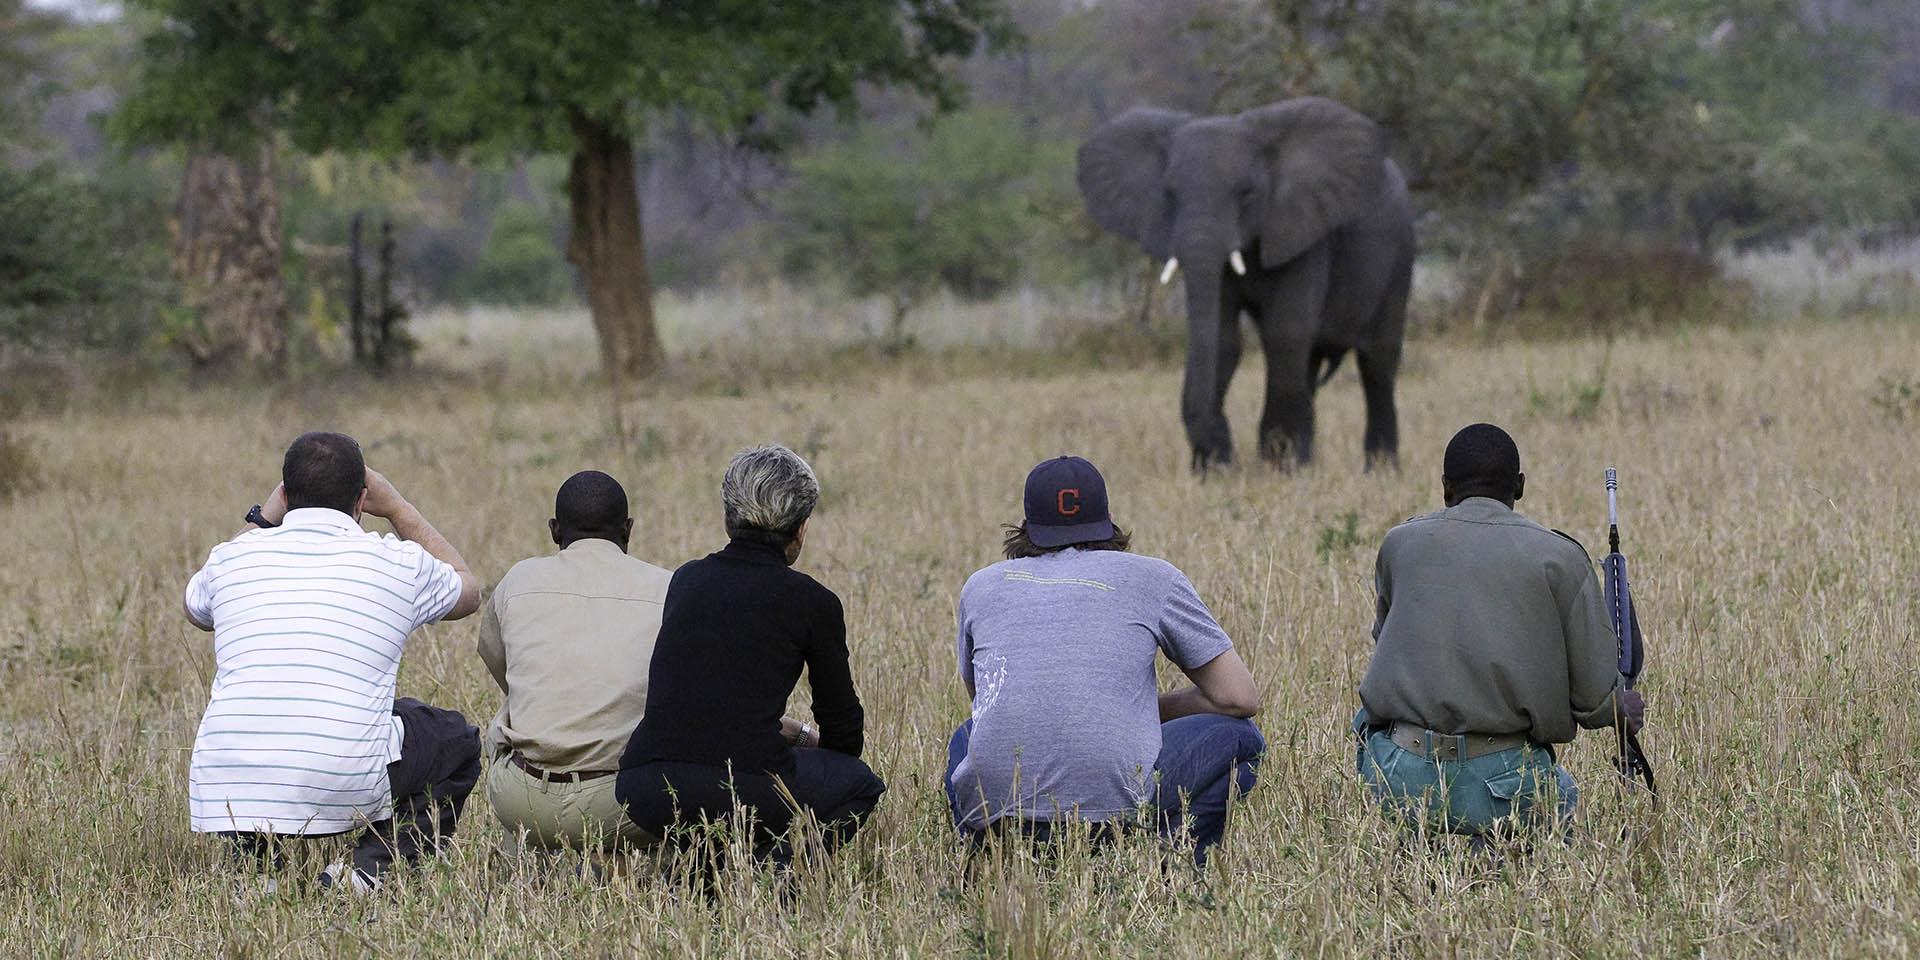 southern explorer 7 nights bush-beach-safaris-tours-malawian-style-malawi-adventures-experiences-specialist-tour-operator-mvuu-walking-safari-liwonde